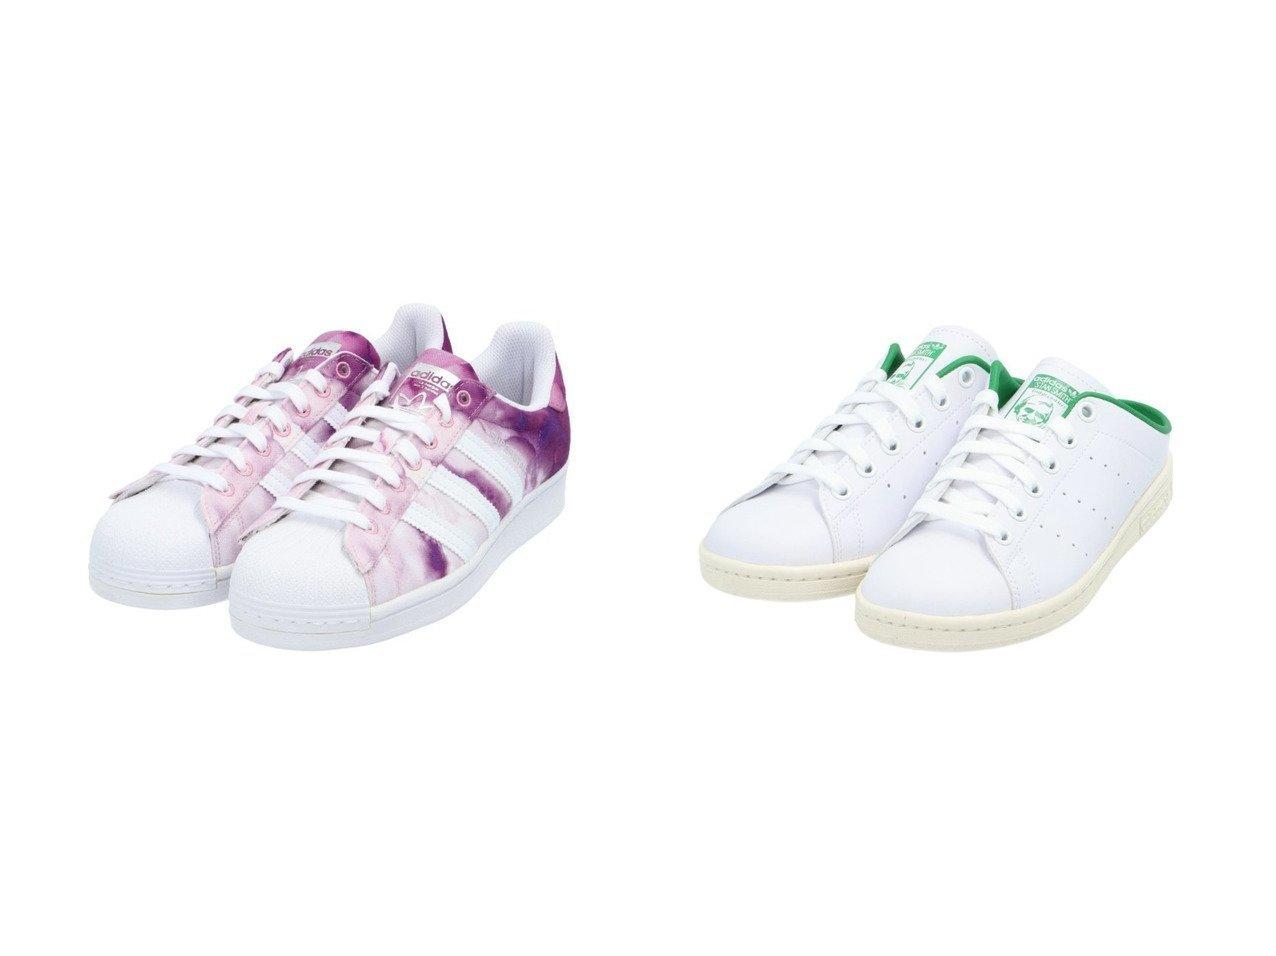 【adidas Originals/アディダス オリジナルス】のスーパースター SUPERSTAR アディダスオリジナルス FX6033 レディース&スタンスミス ミュール Stan Smith Mules アディダスオリジナルス FX5849 【シューズ・靴】おすすめ!人気、トレンド・レディースファッションの通販 おすすめで人気の流行・トレンド、ファッションの通販商品 メンズファッション・キッズファッション・インテリア・家具・レディースファッション・服の通販 founy(ファニー) https://founy.com/ ファッション Fashion レディースファッション WOMEN 今季 サンダル シューズ スニーカー スポーツ スリッポン 定番 Standard ミックス ミュール カラフル プリント |ID:crp329100000029188